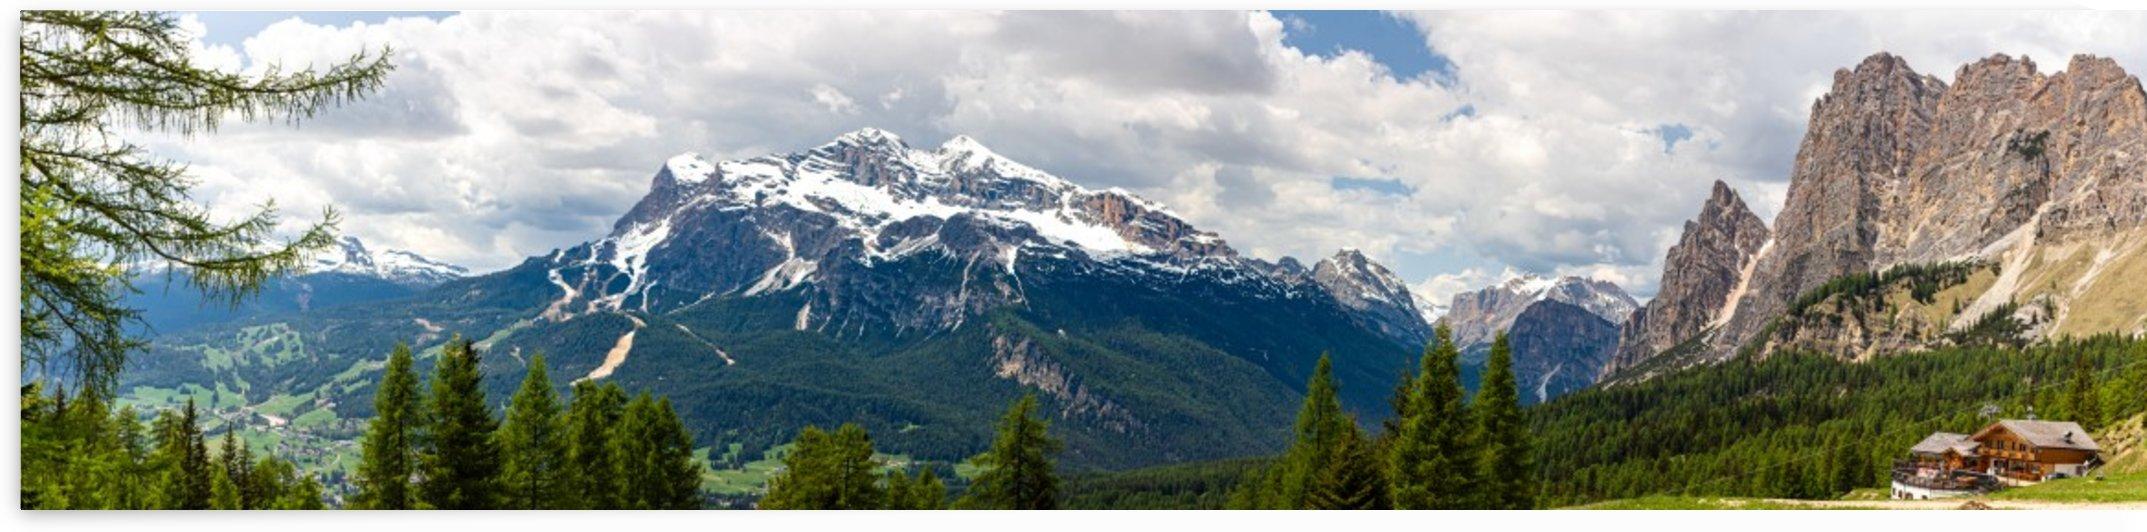 Dolomites Panorama by Jules Siegel